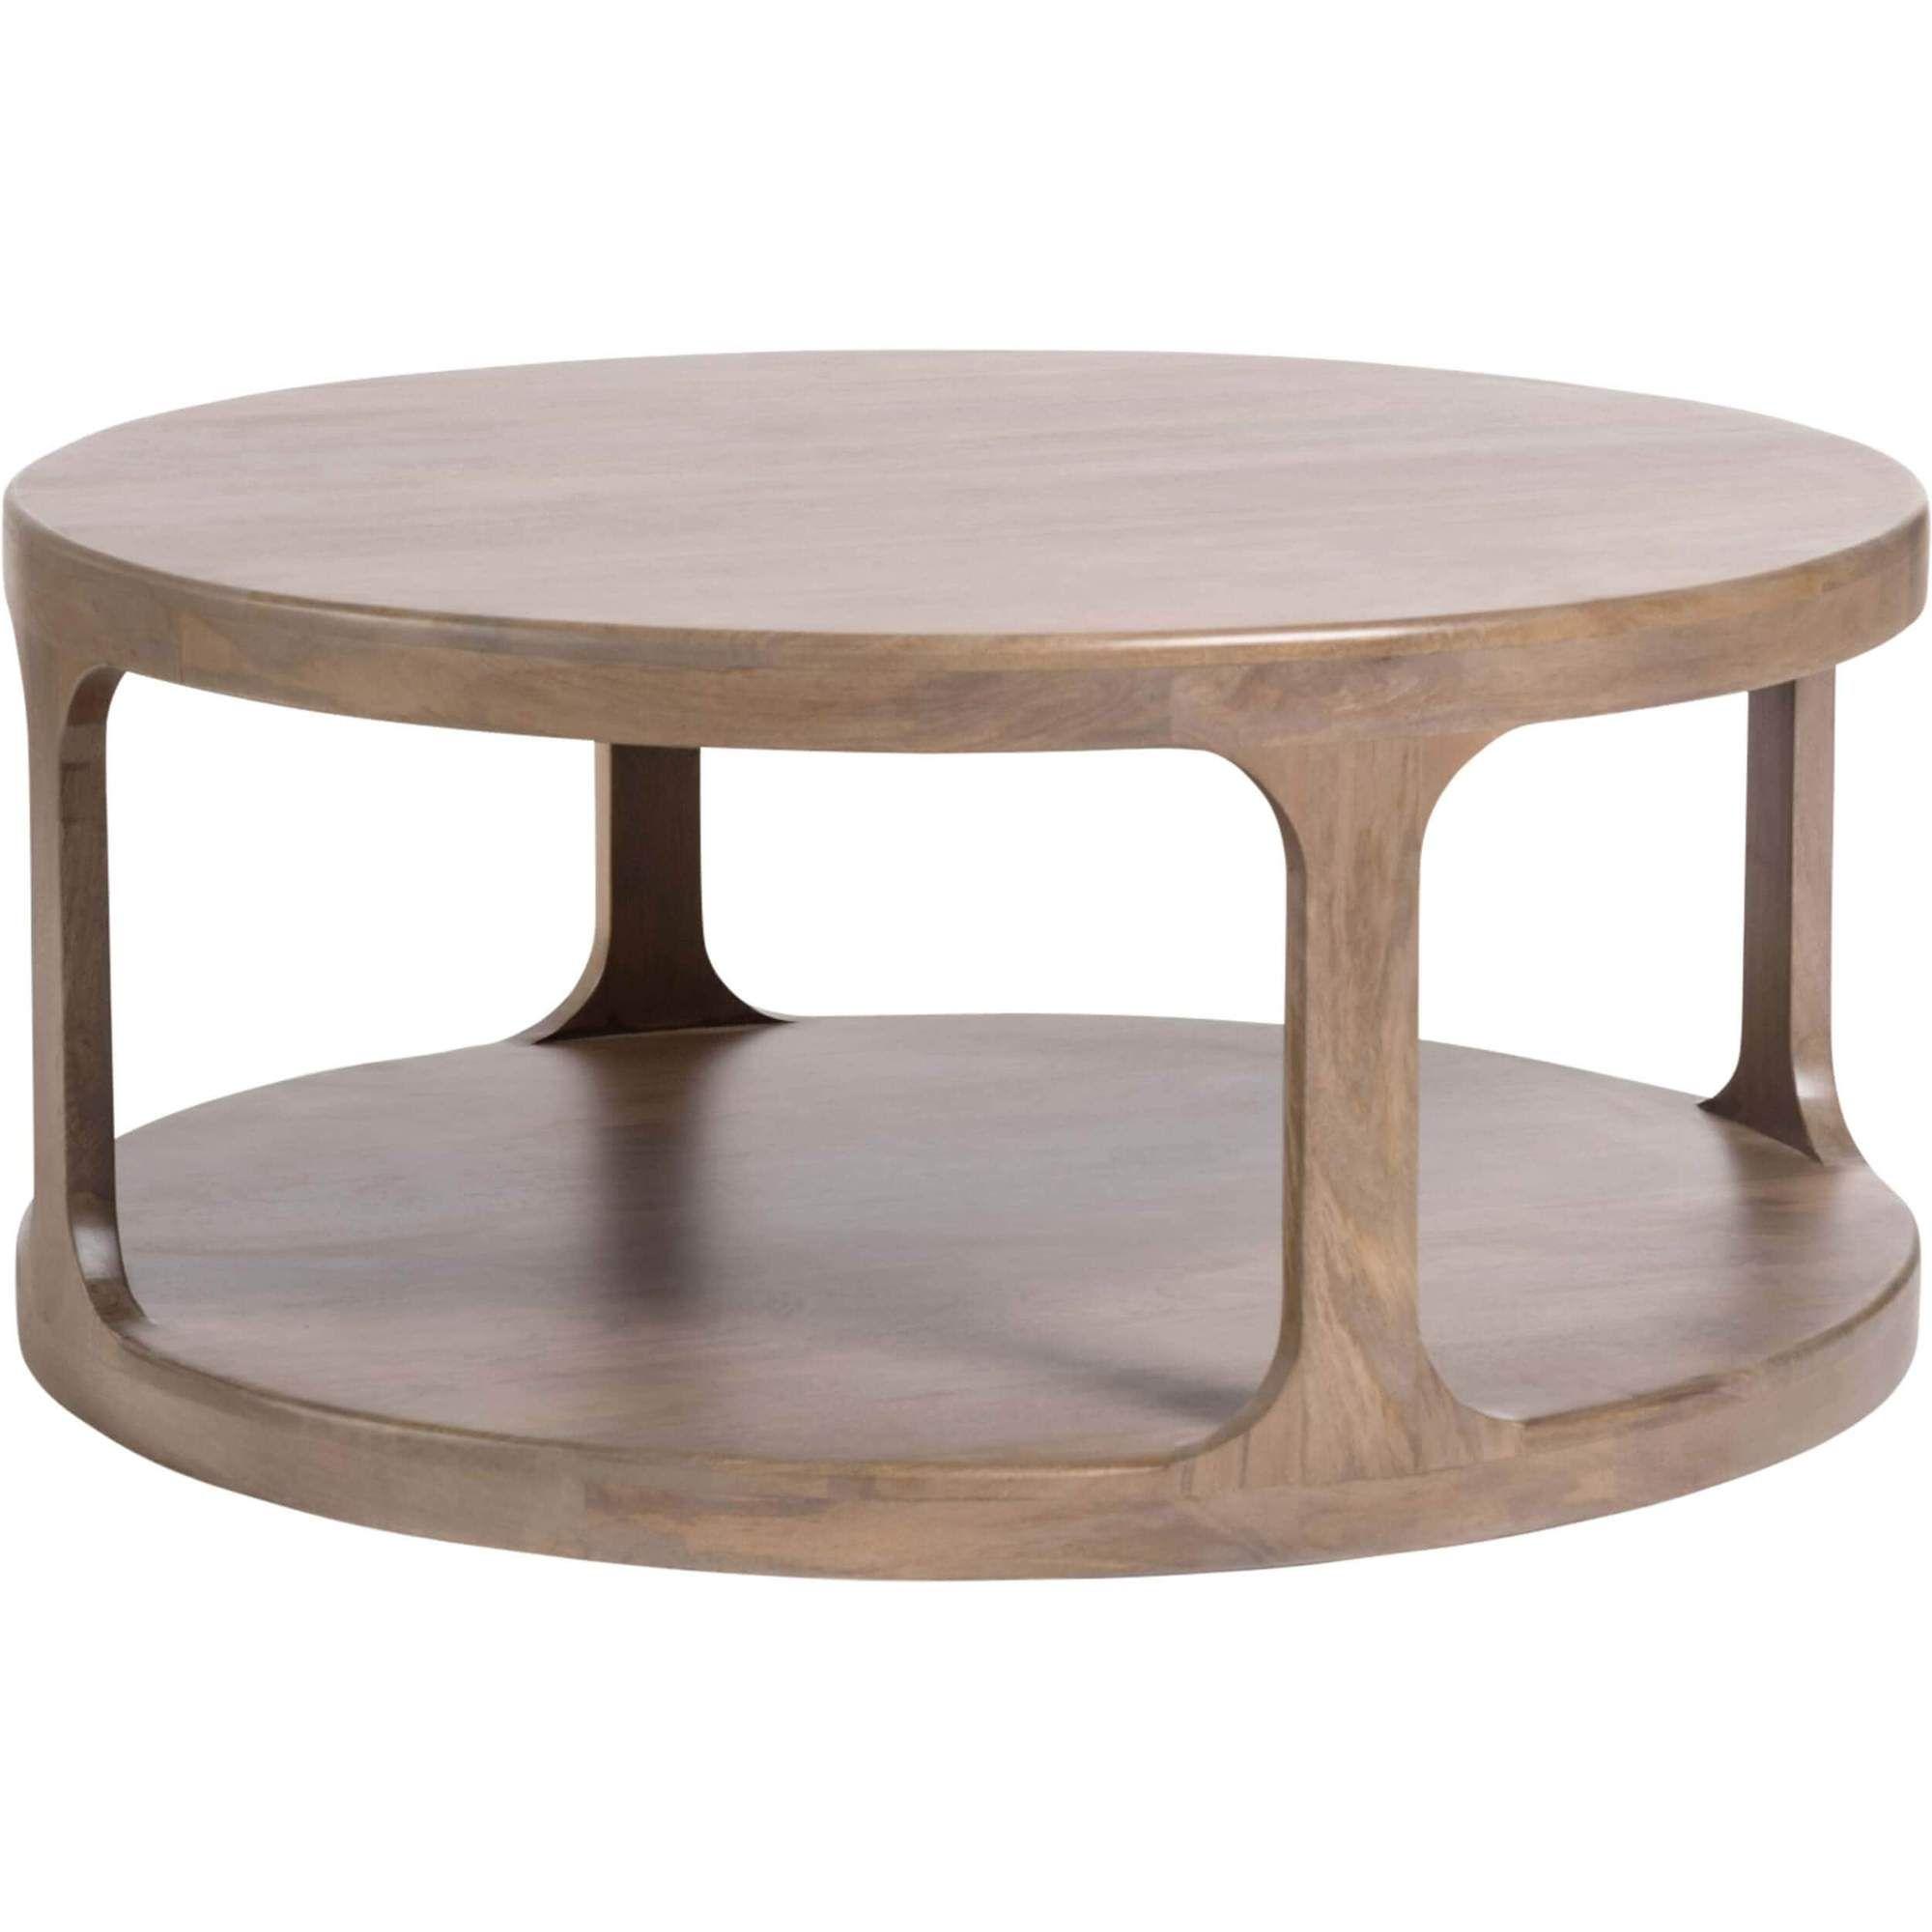 Mason Coffee Table Coffee Table Round Wood Coffee Table Coffee Table Wood [ 2000 x 2000 Pixel ]